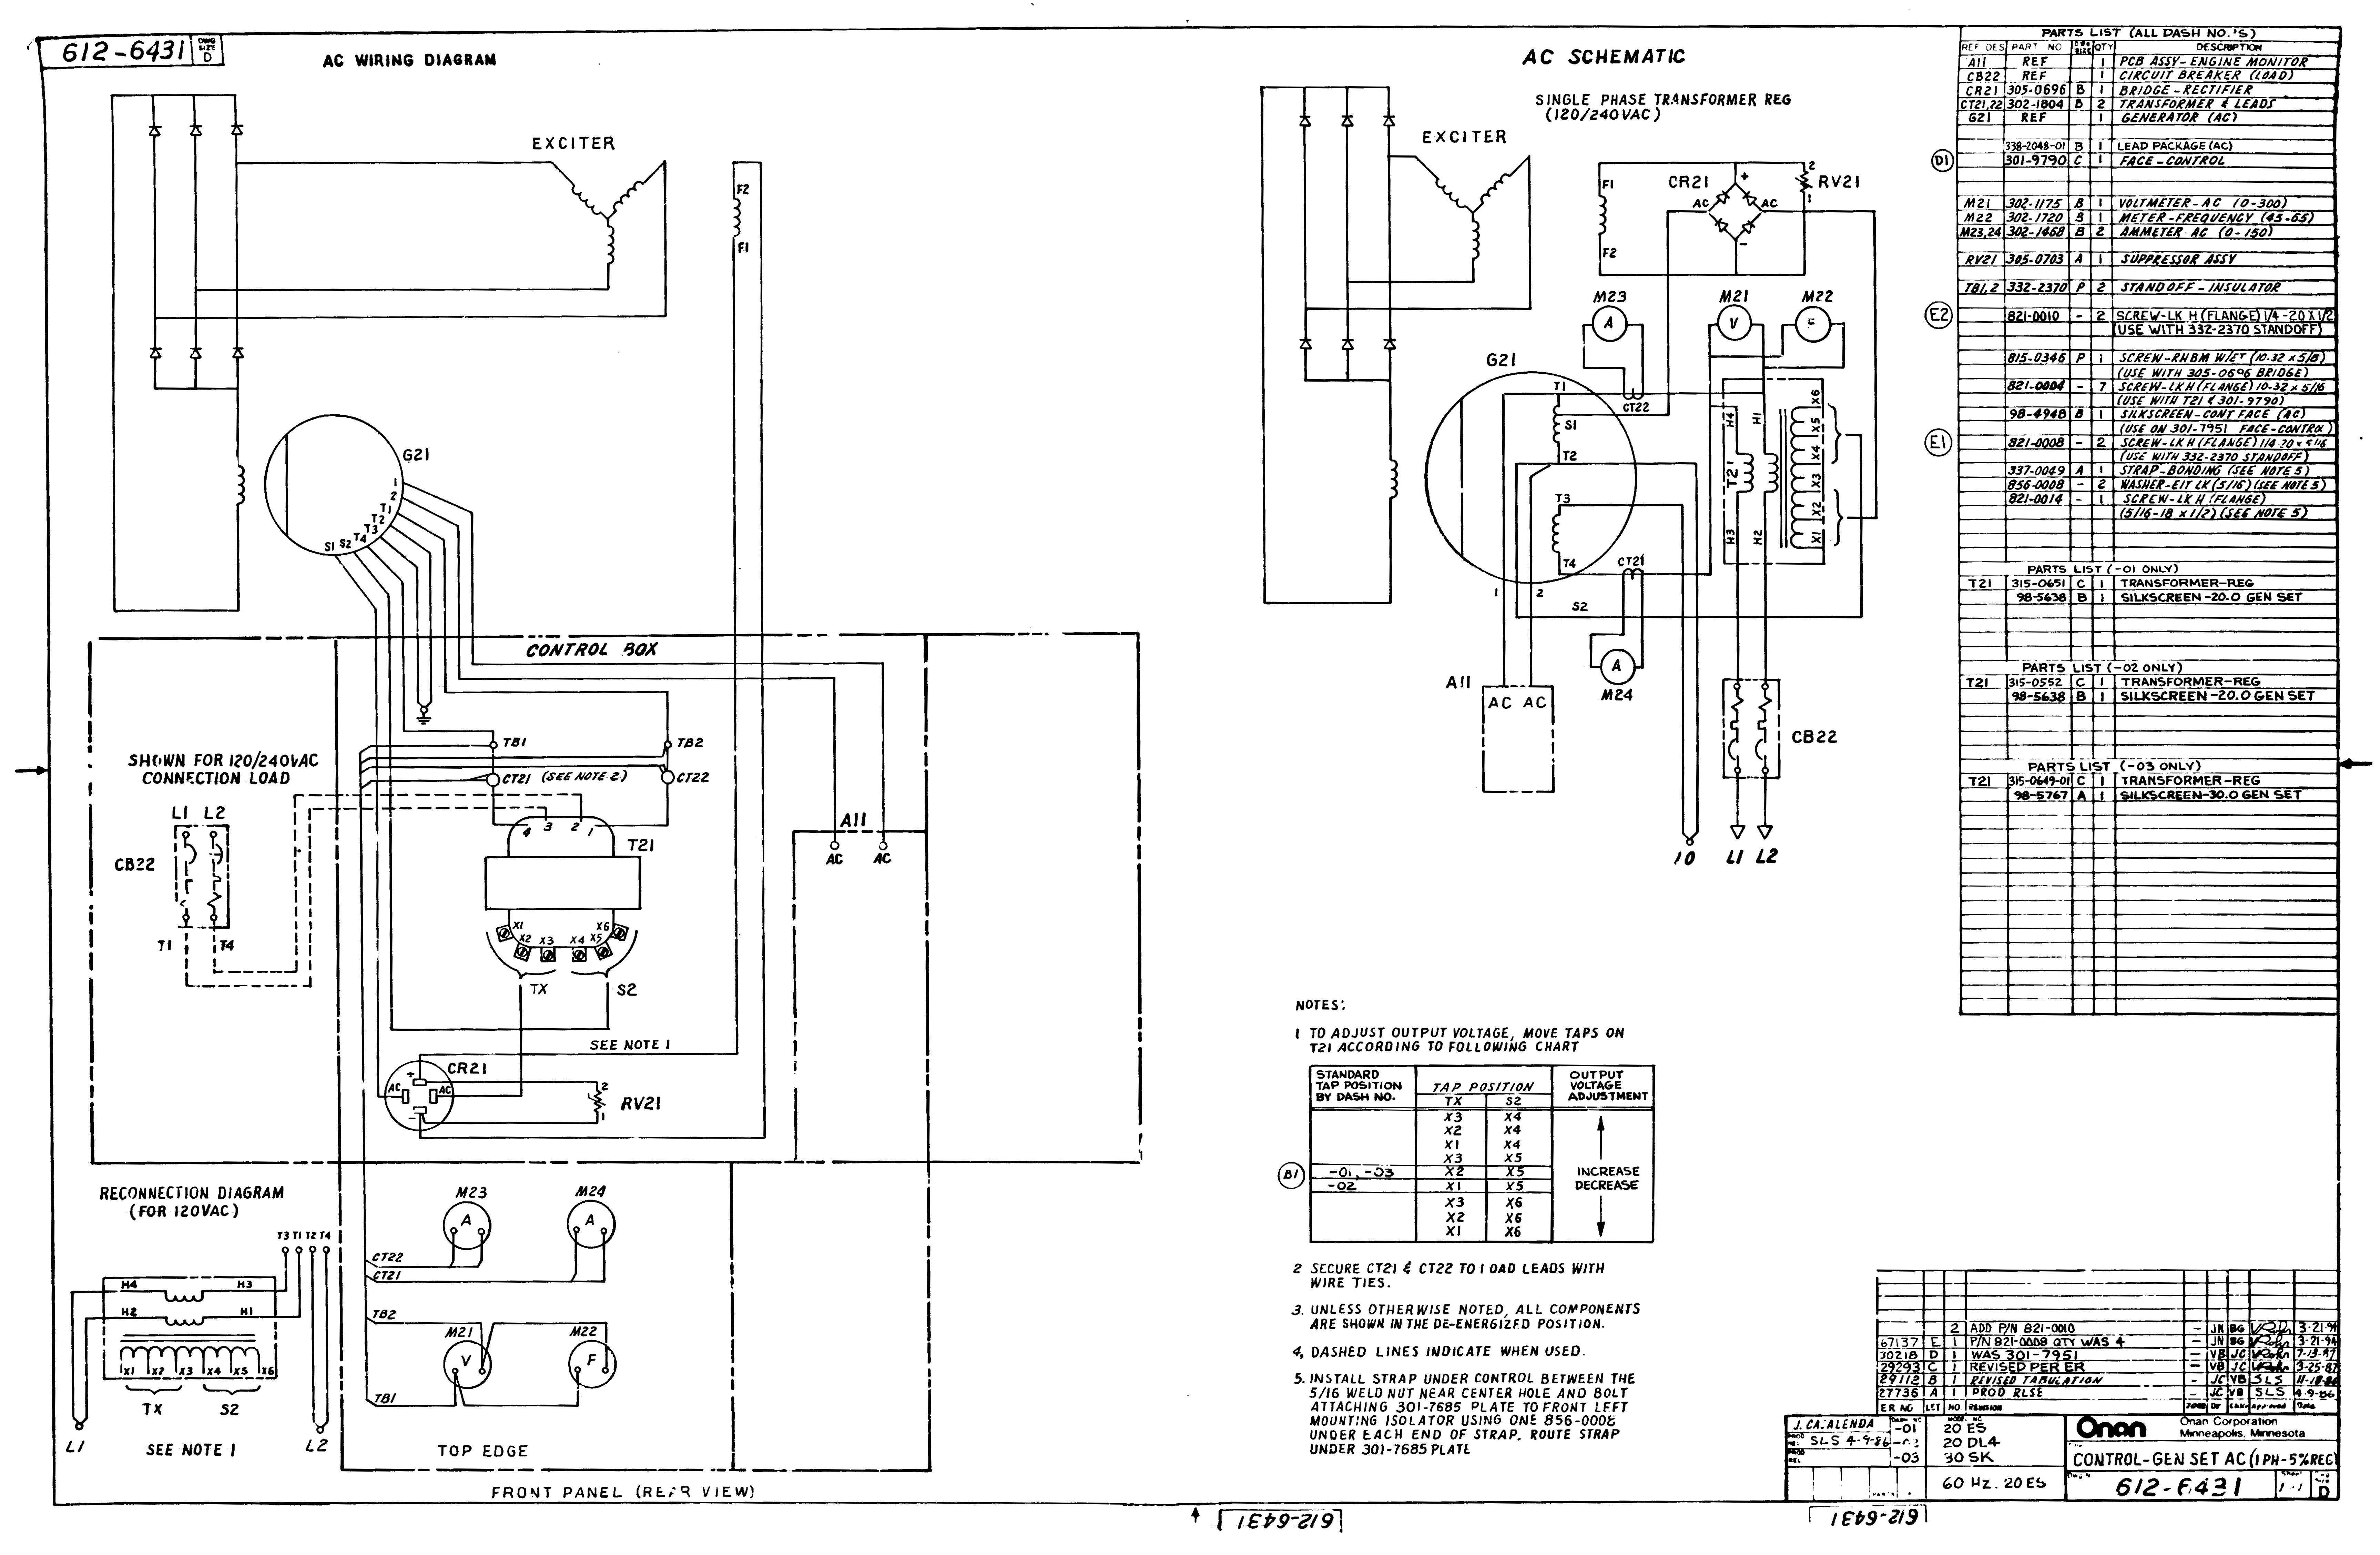 Directv Wiring Diagram Inspirational Great Directv Genie Wiring Diagram S Electrical and Wiring